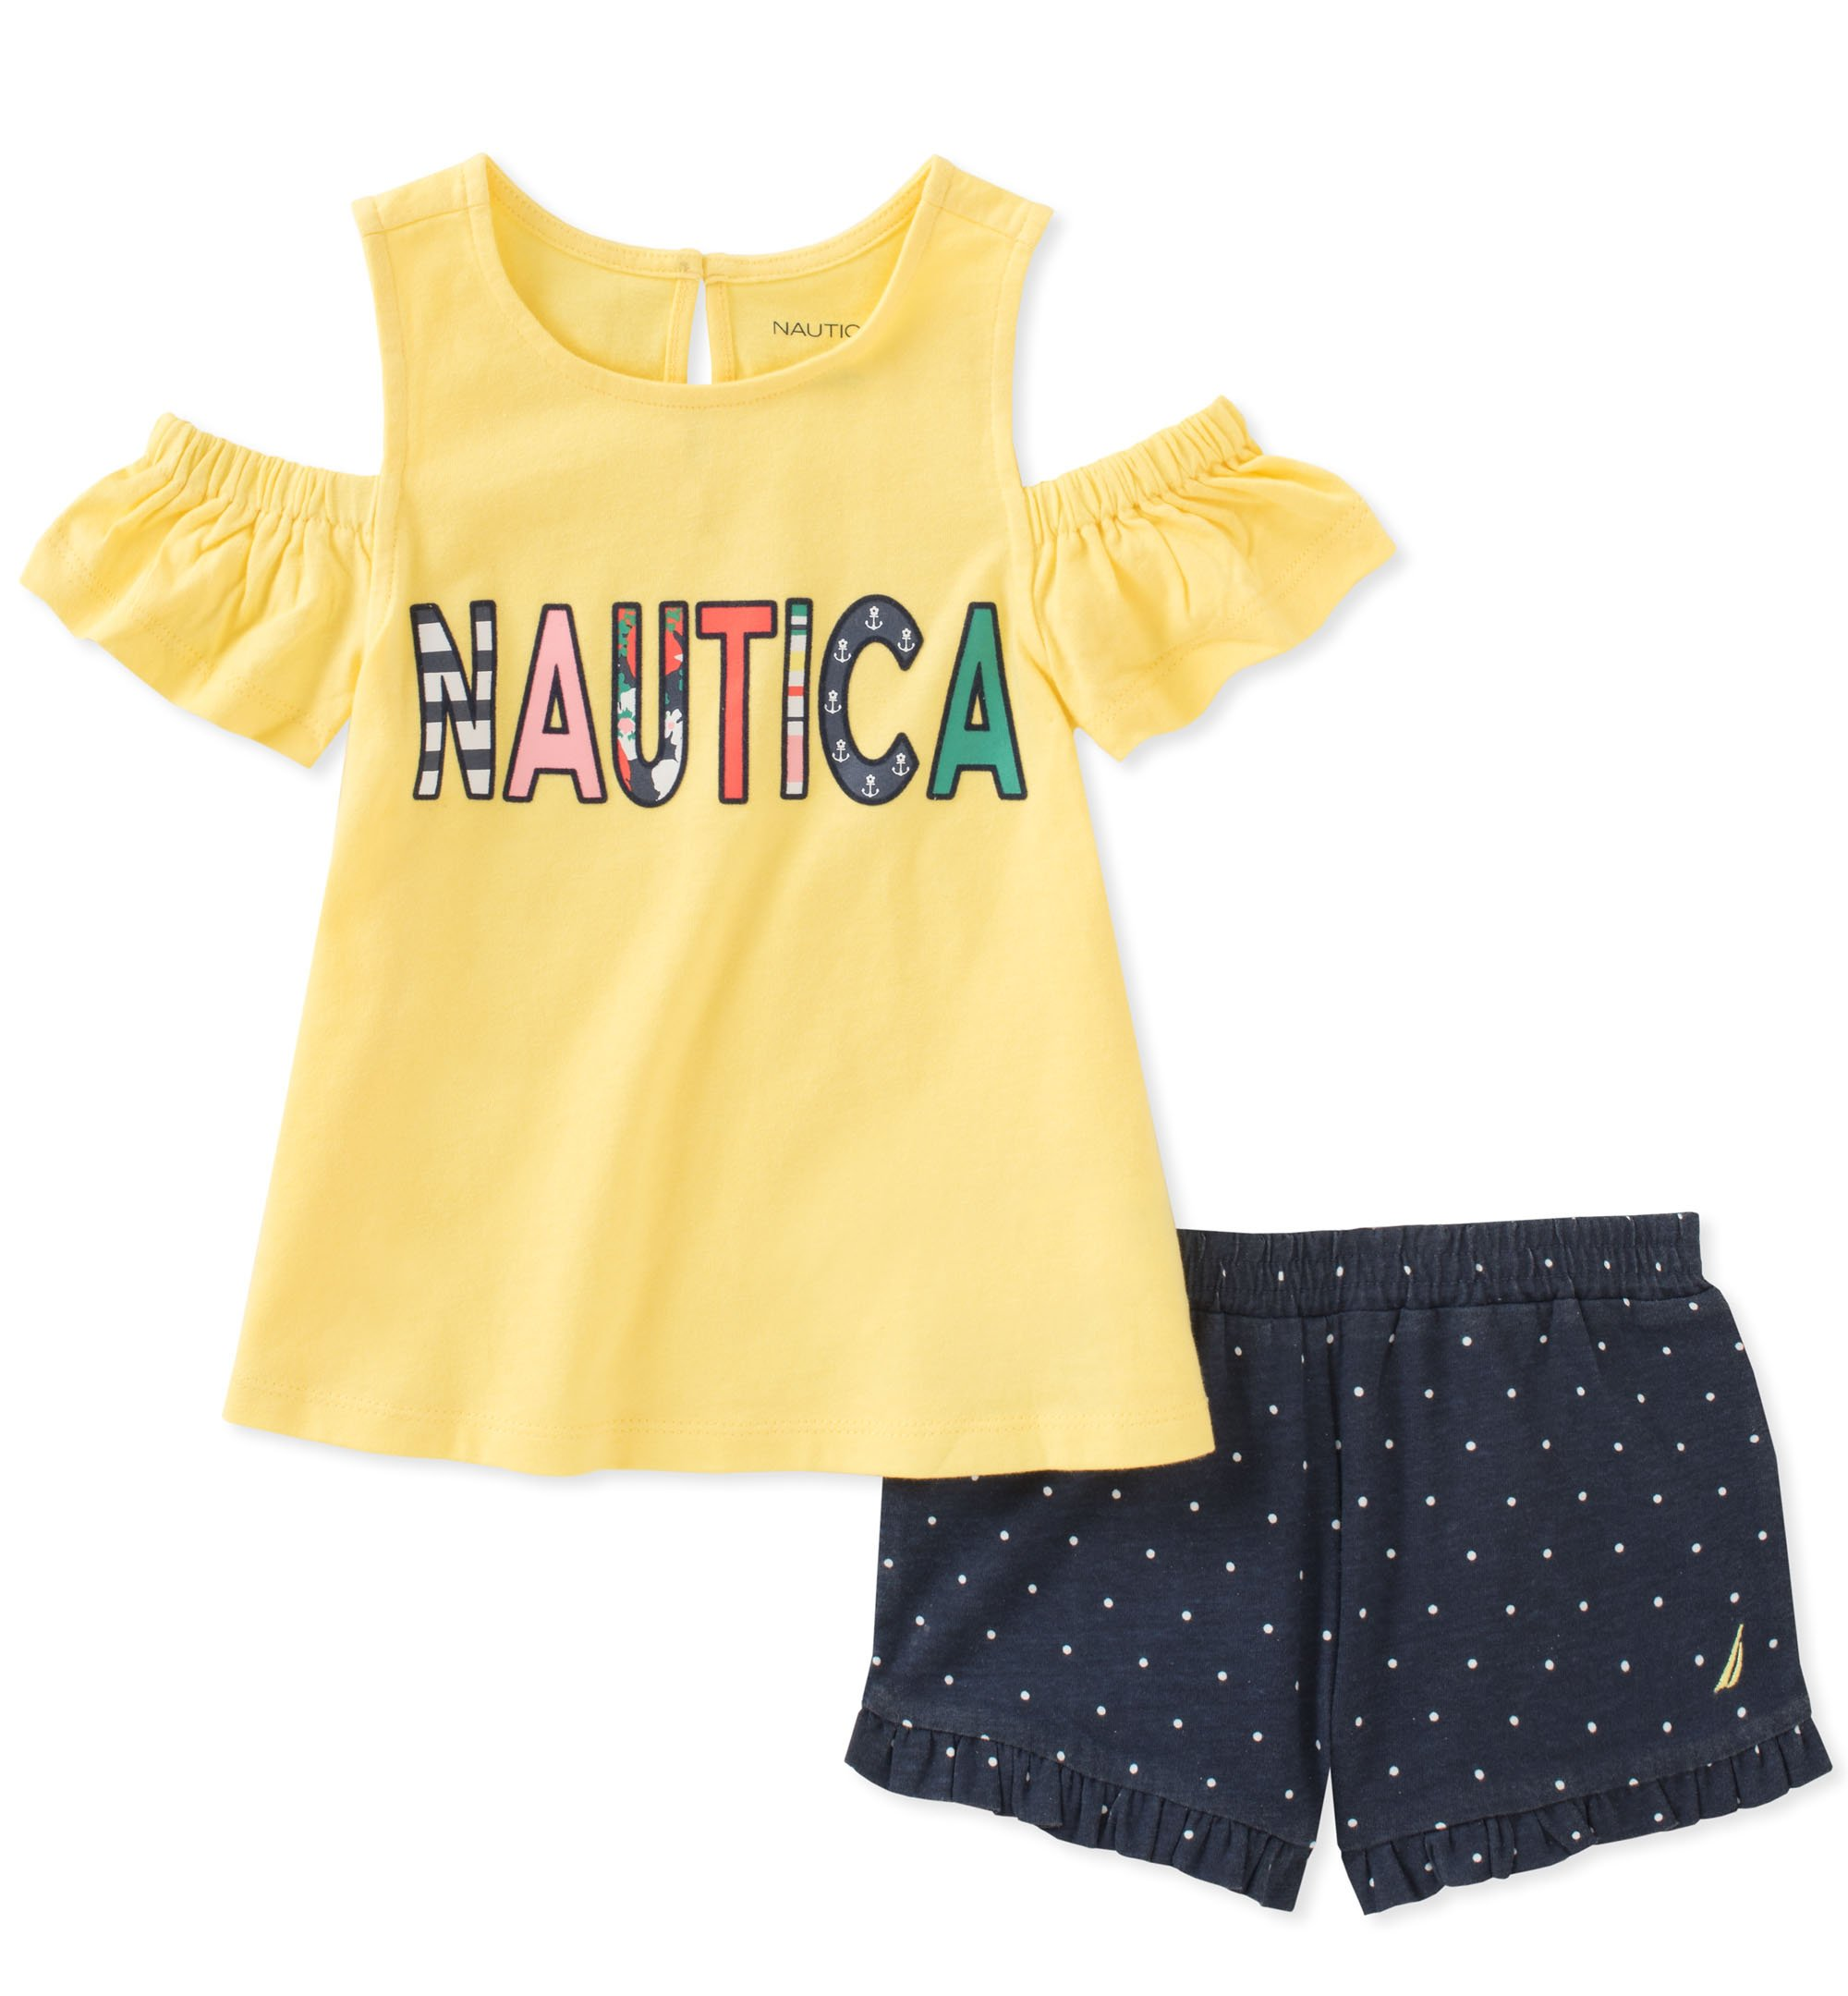 Nautica Little Girls' Shorts Set, Yellow/Navy, 6X